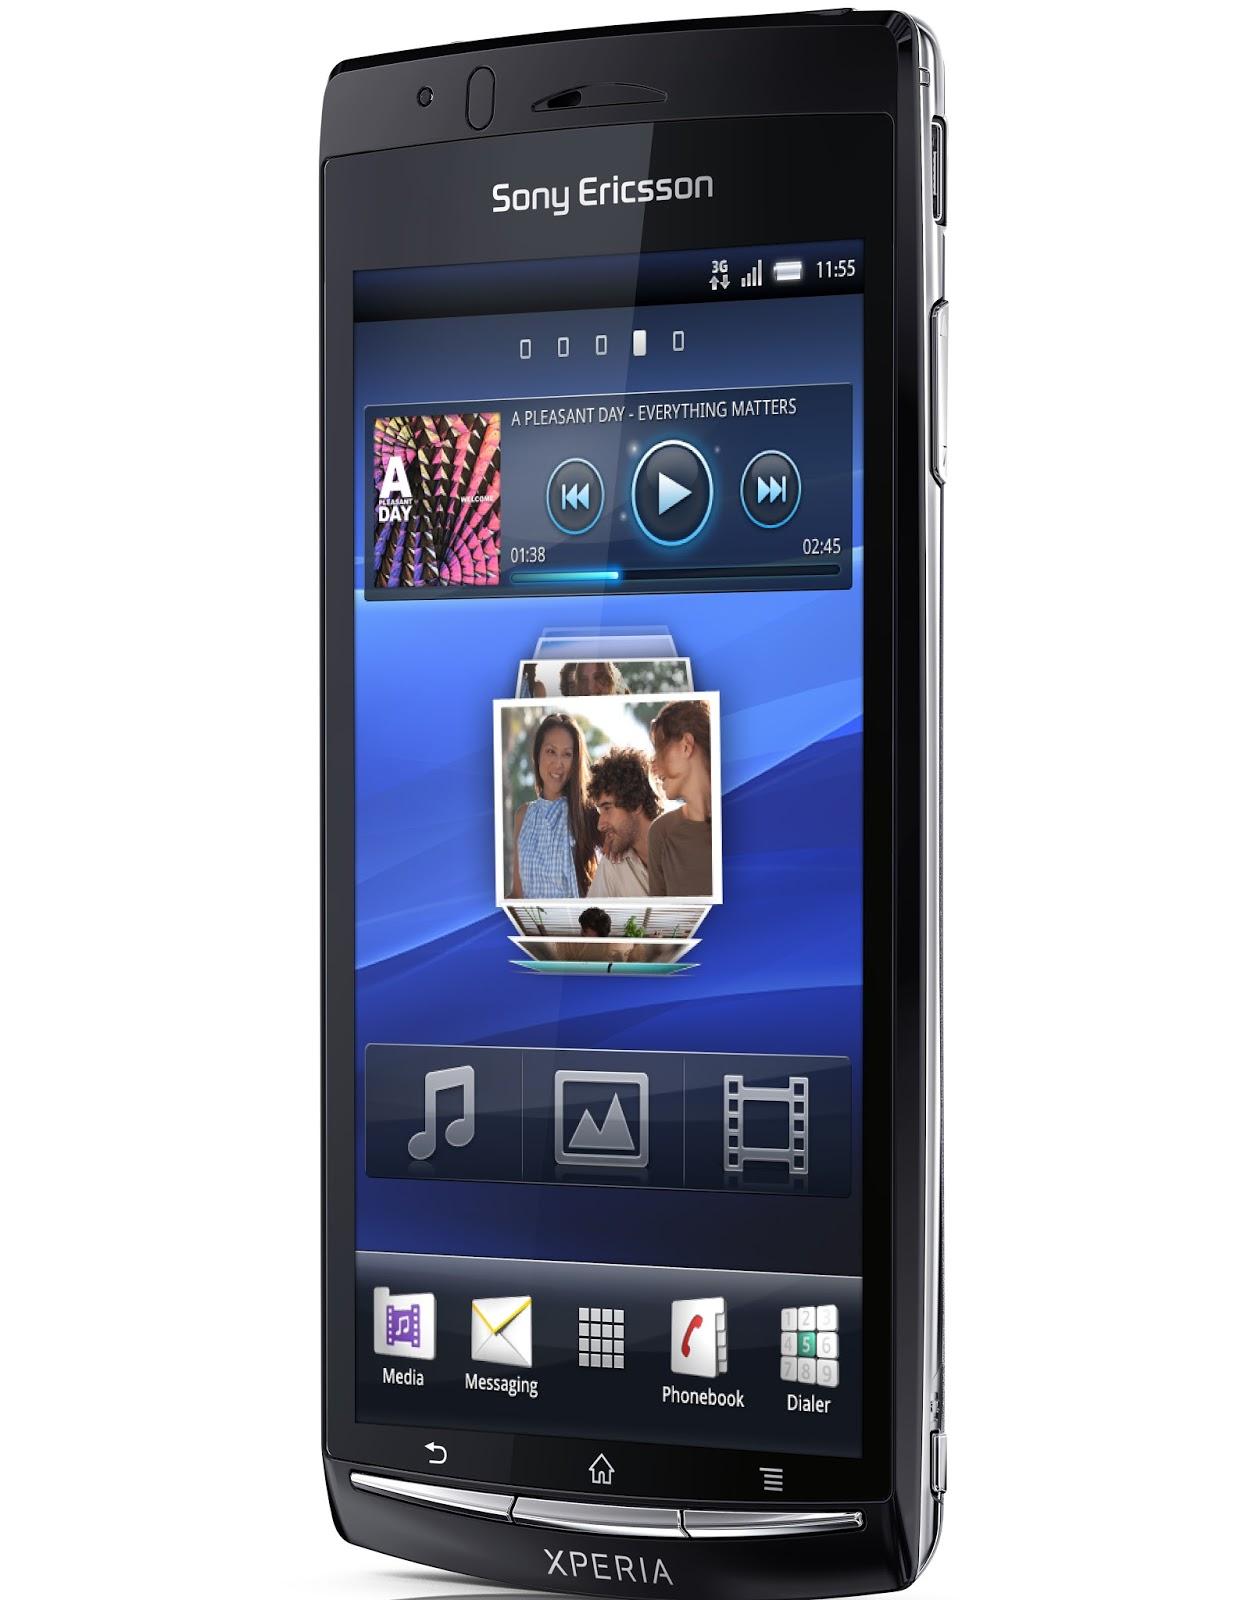 Download Sony bdp-s590 firmware downgrade